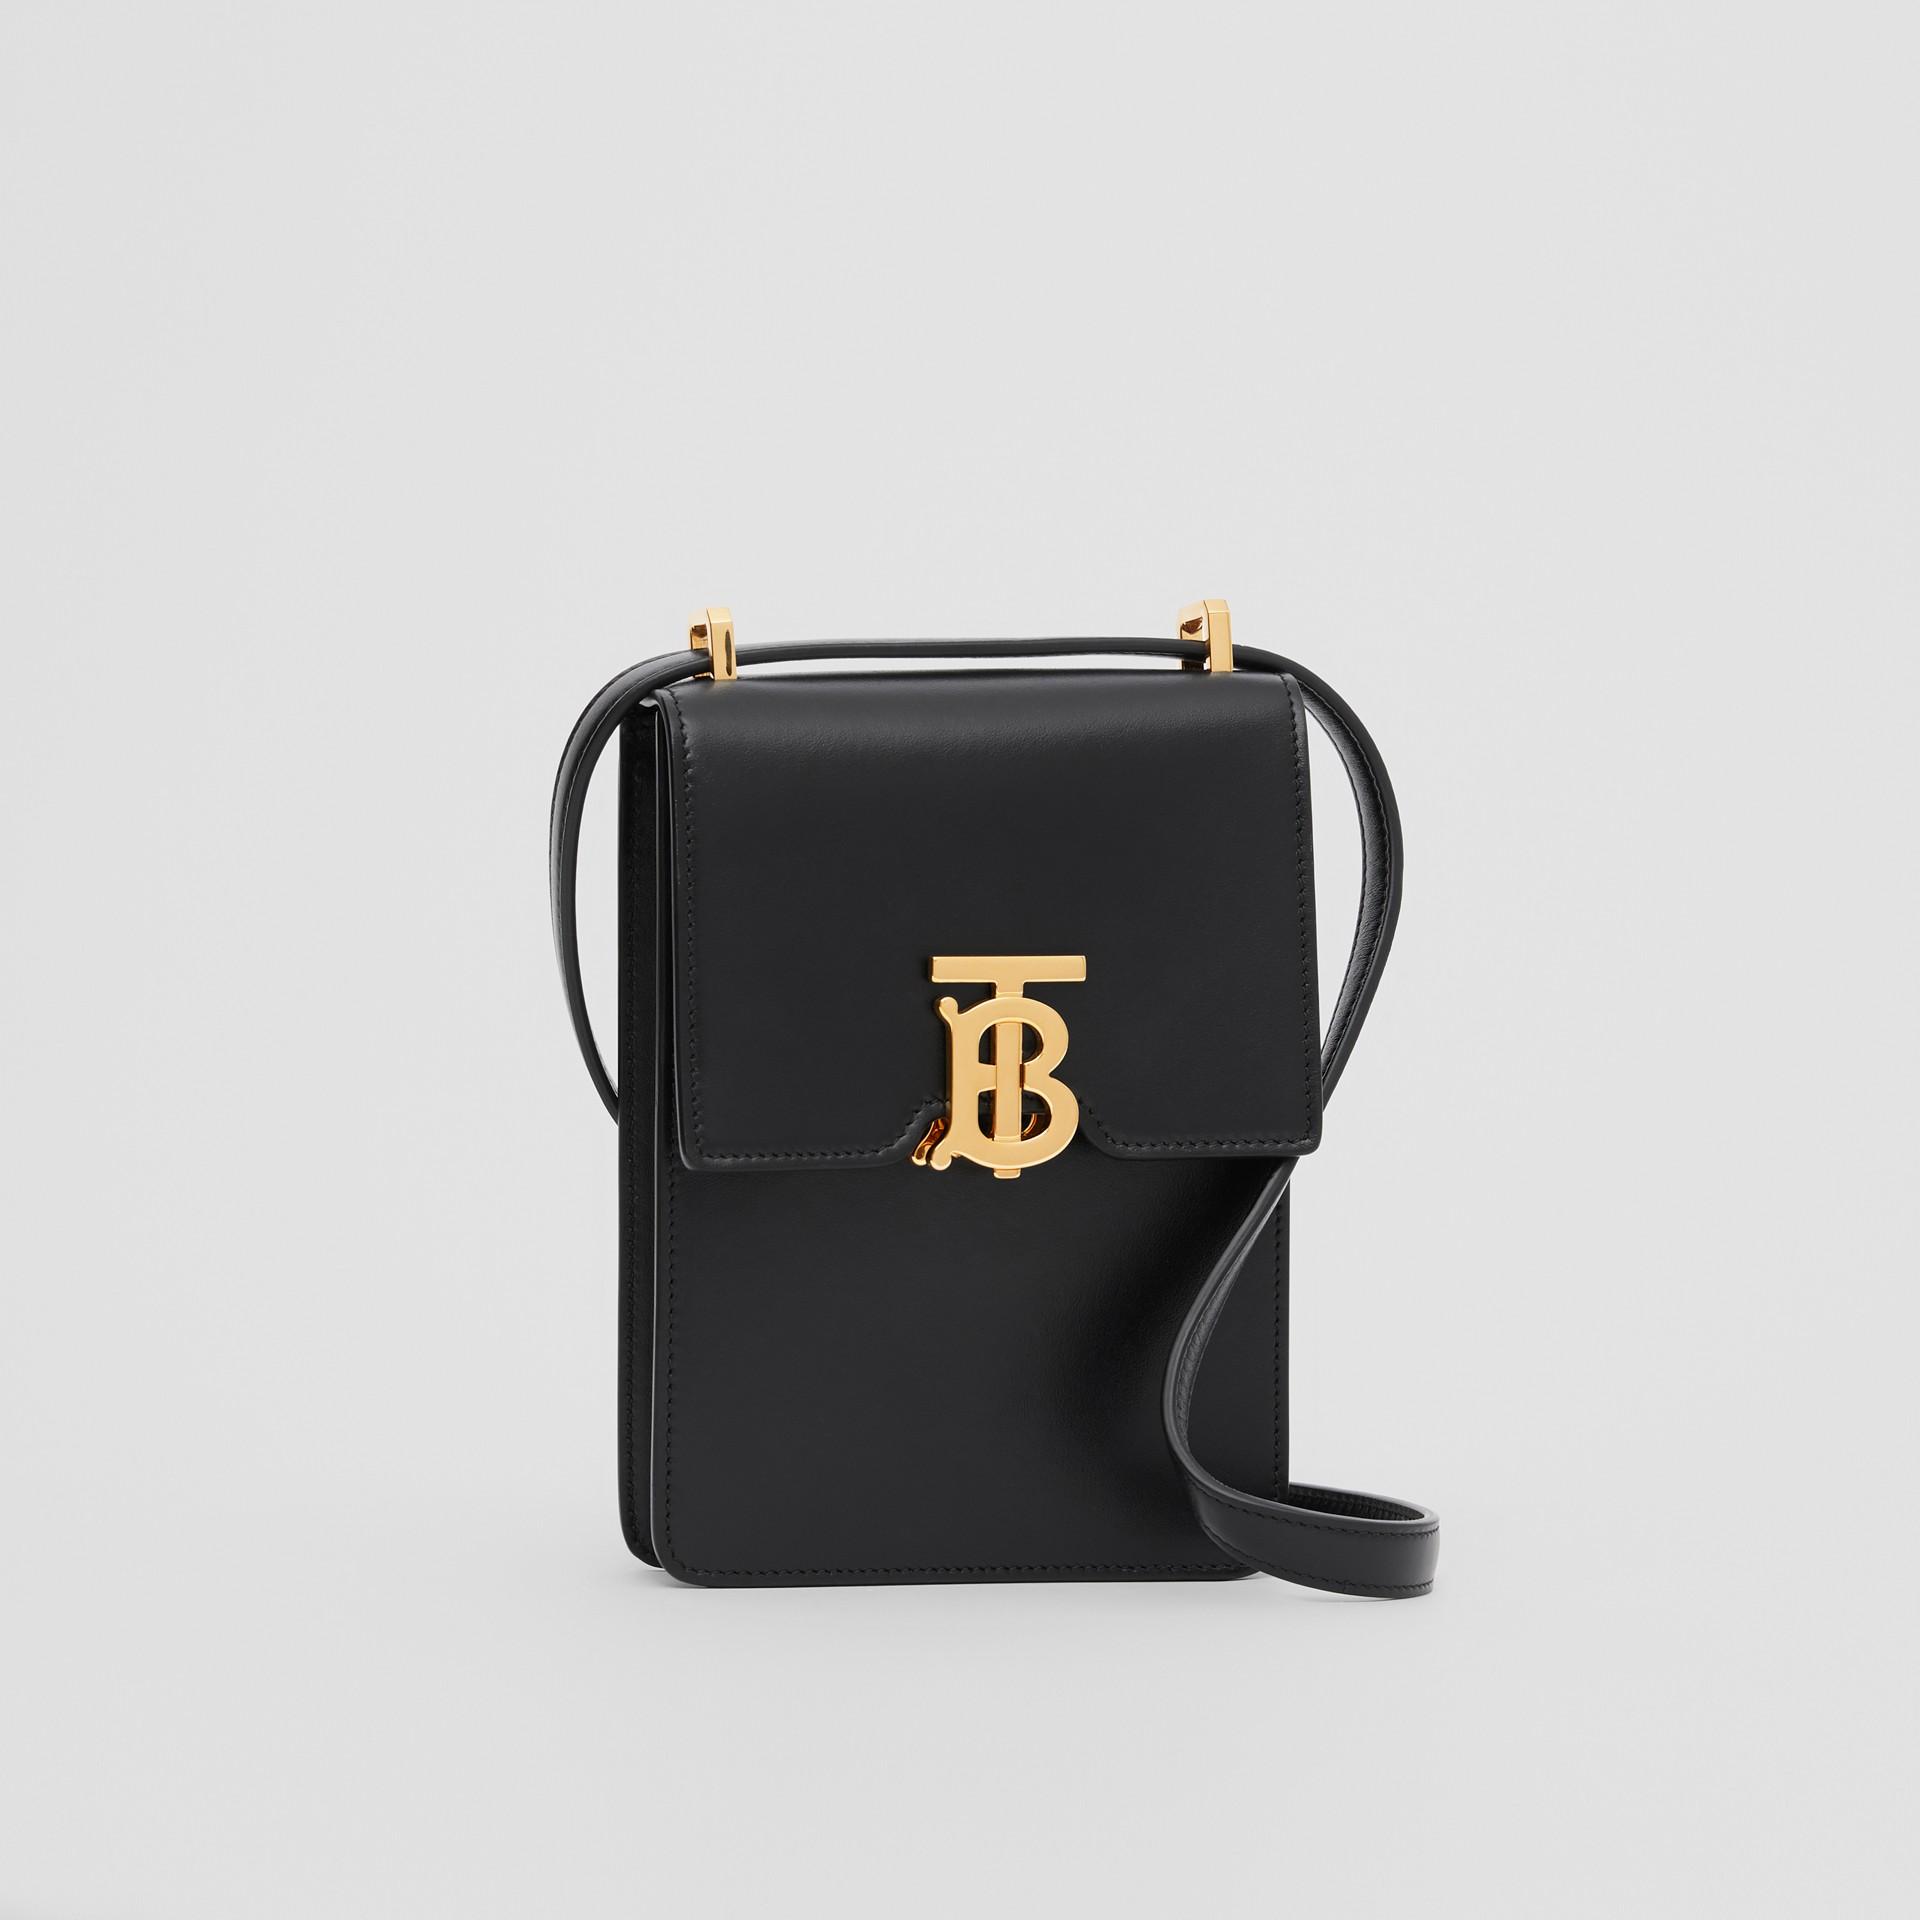 Leather Robin Bag in Black - Women | Burberry Australia - gallery image 8